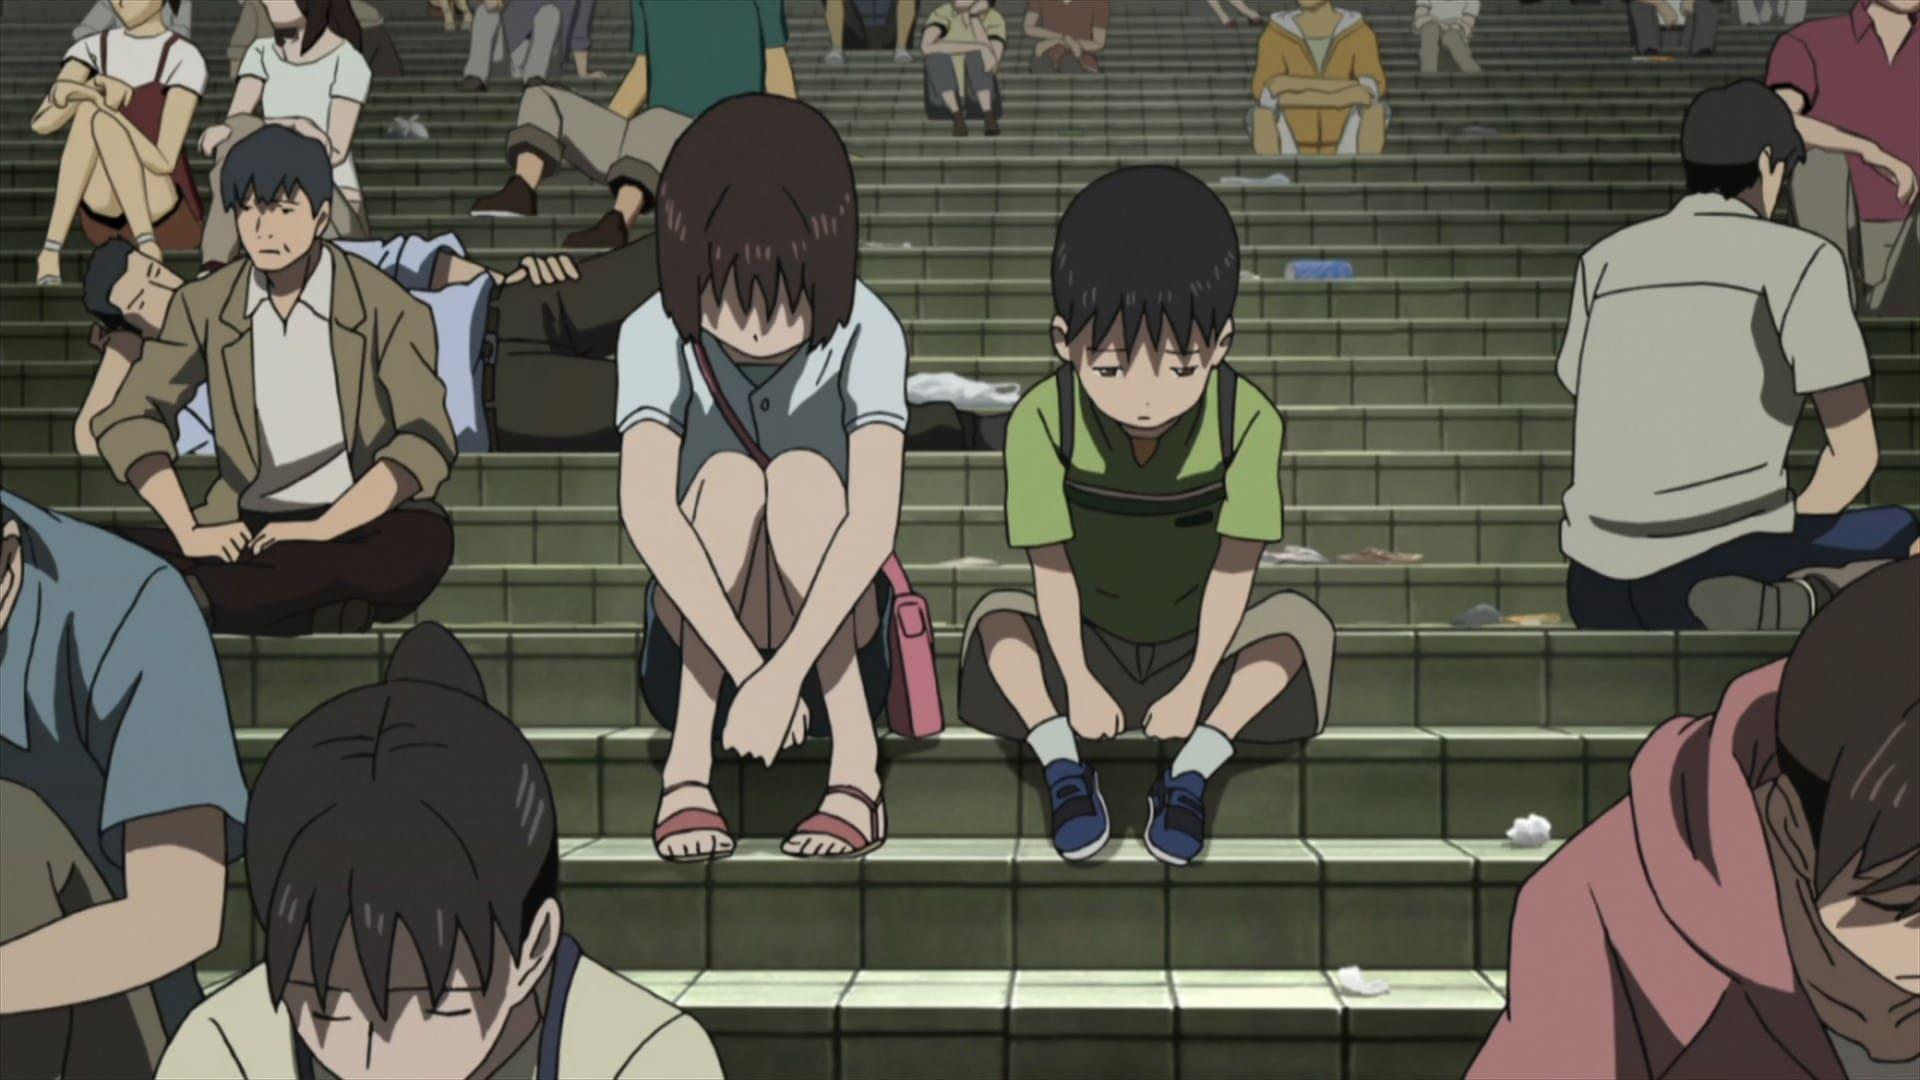 Sad Depressing Earthquake anime, Tokyo Magnitude 8.0